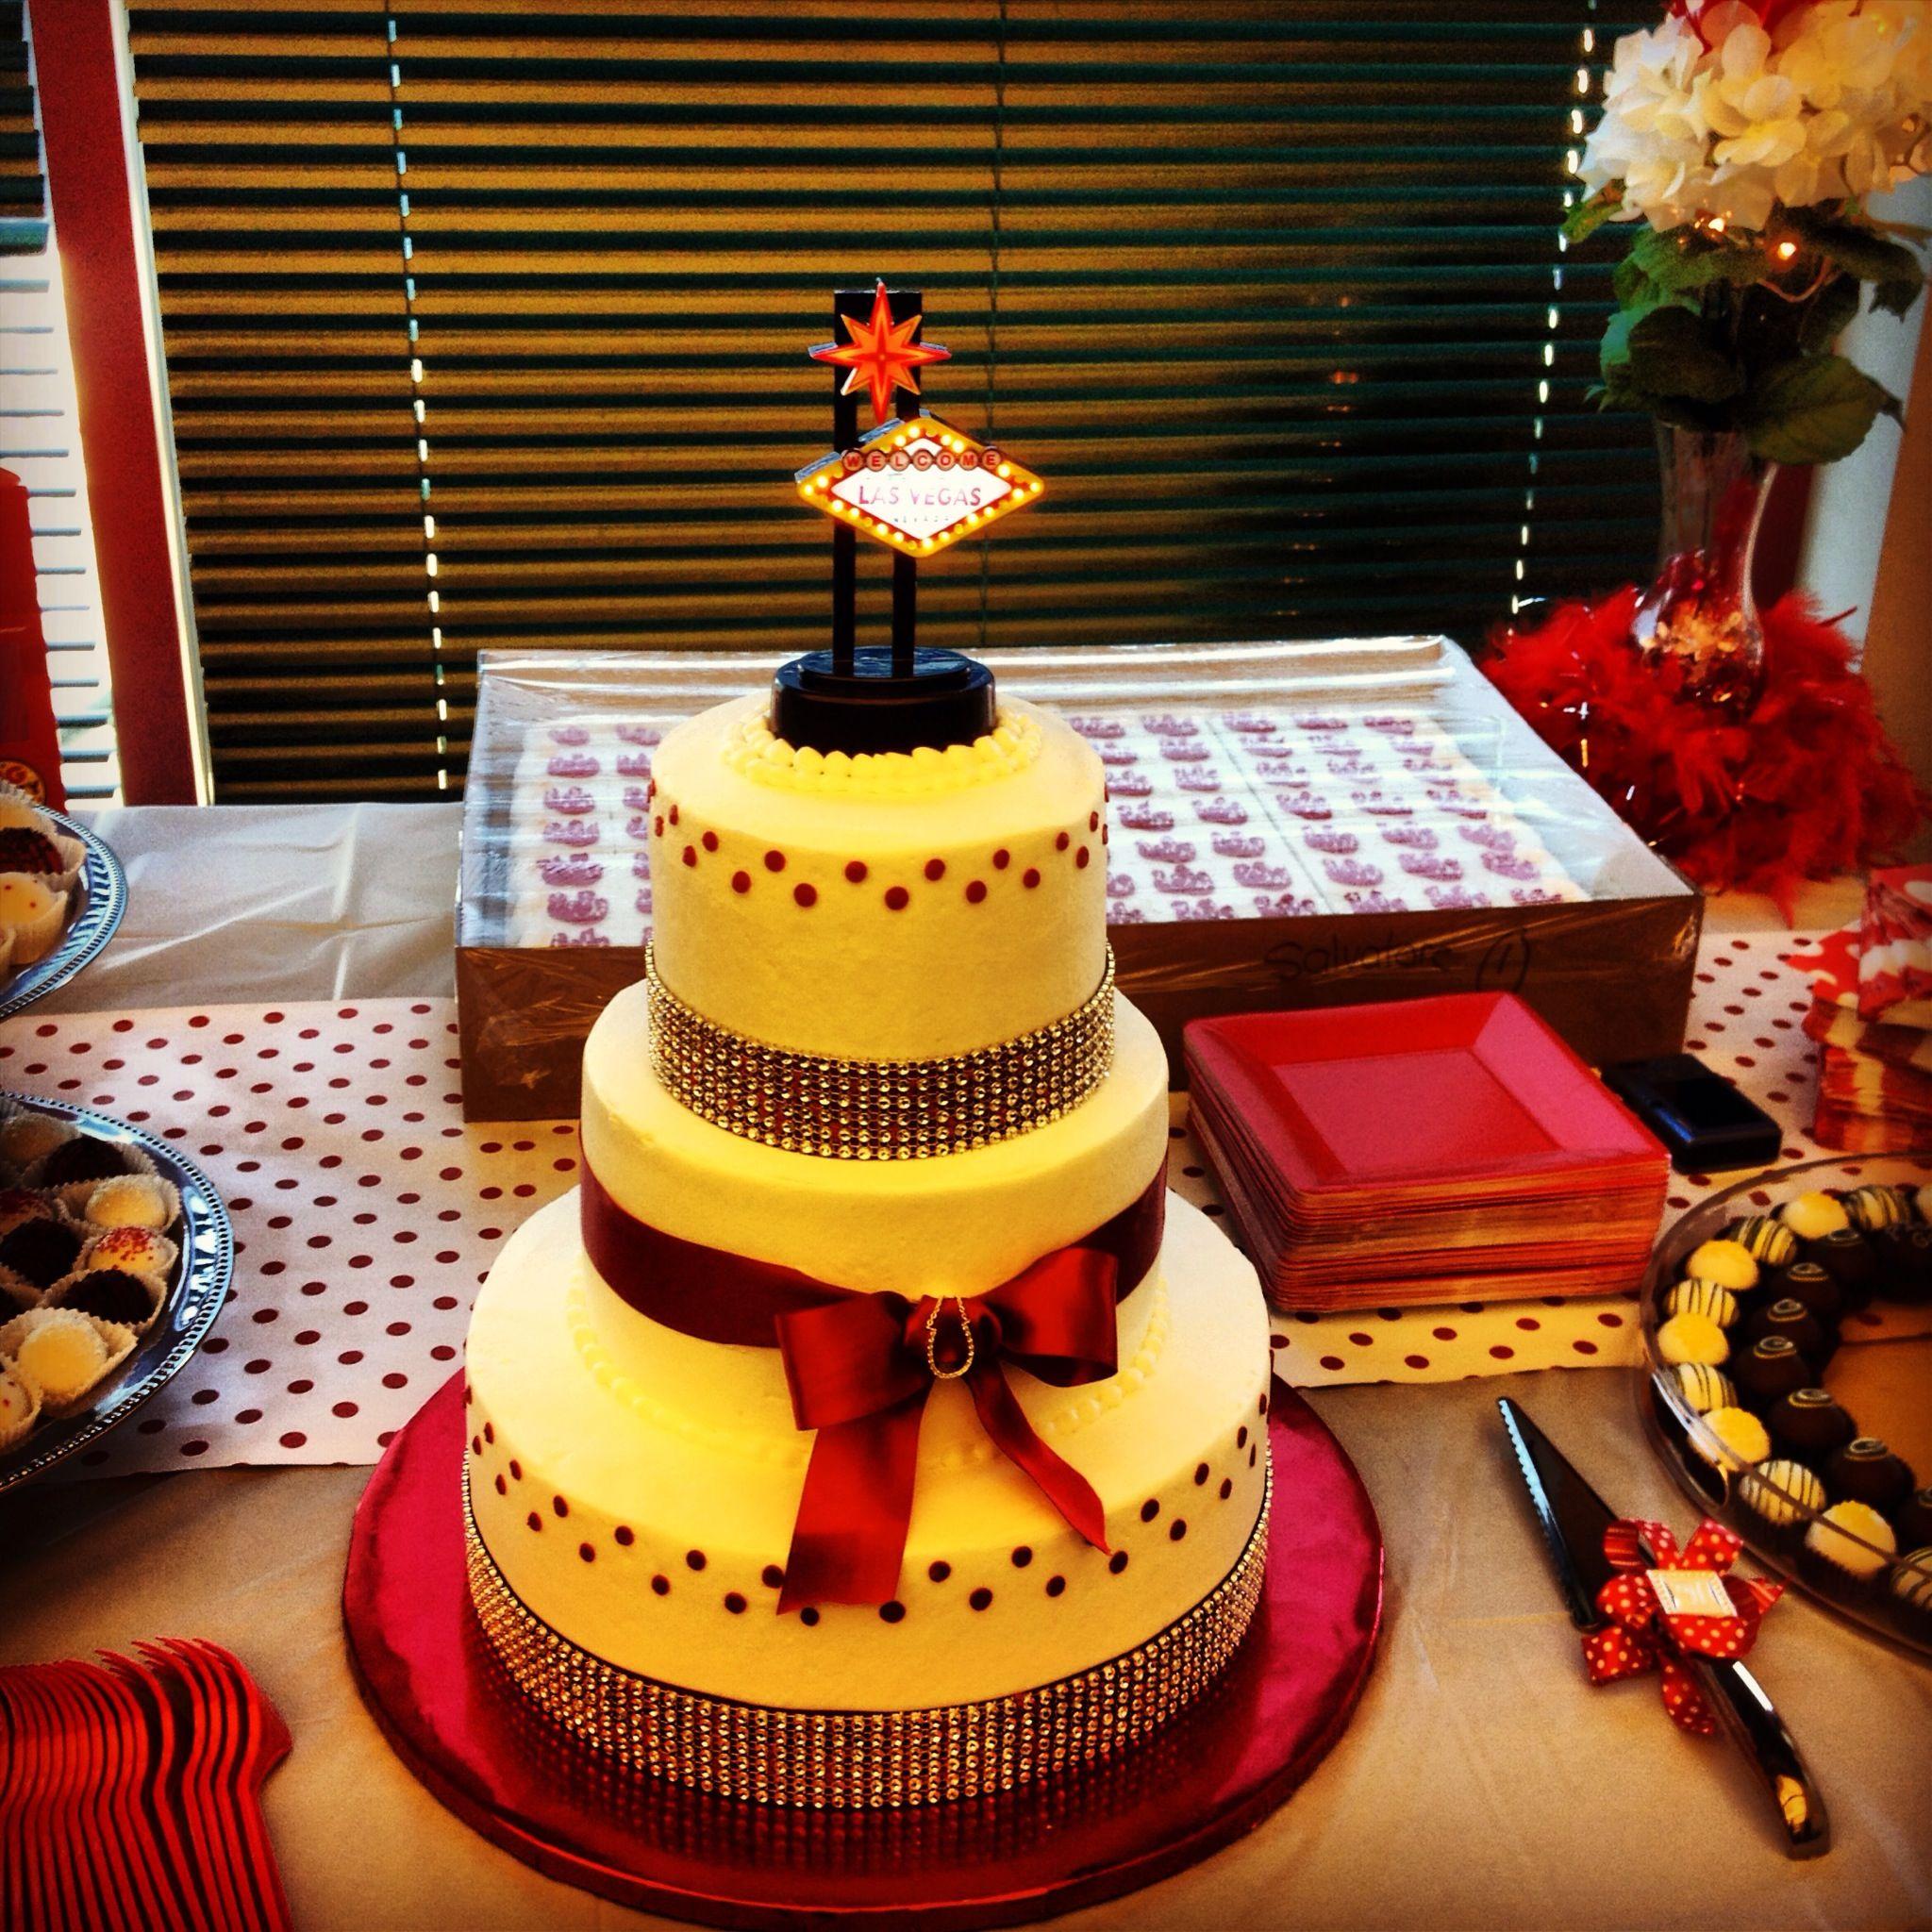 Vegas Wedding Vegas wedding, Amazing cakes, Cupcake cakes